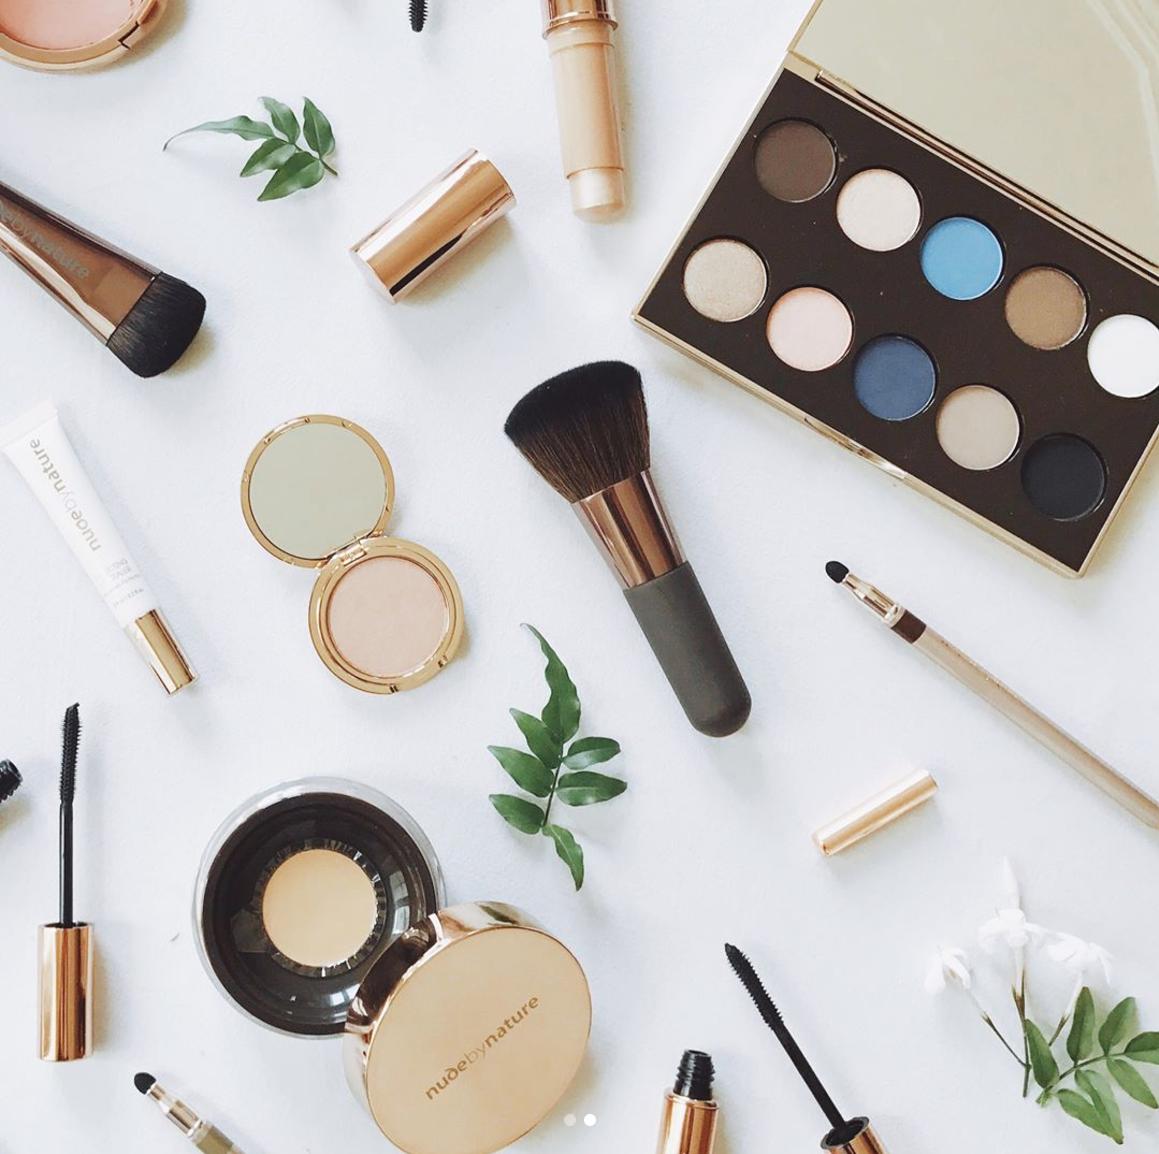 thebaloondiary Mineral makeup brands, Makeup brands